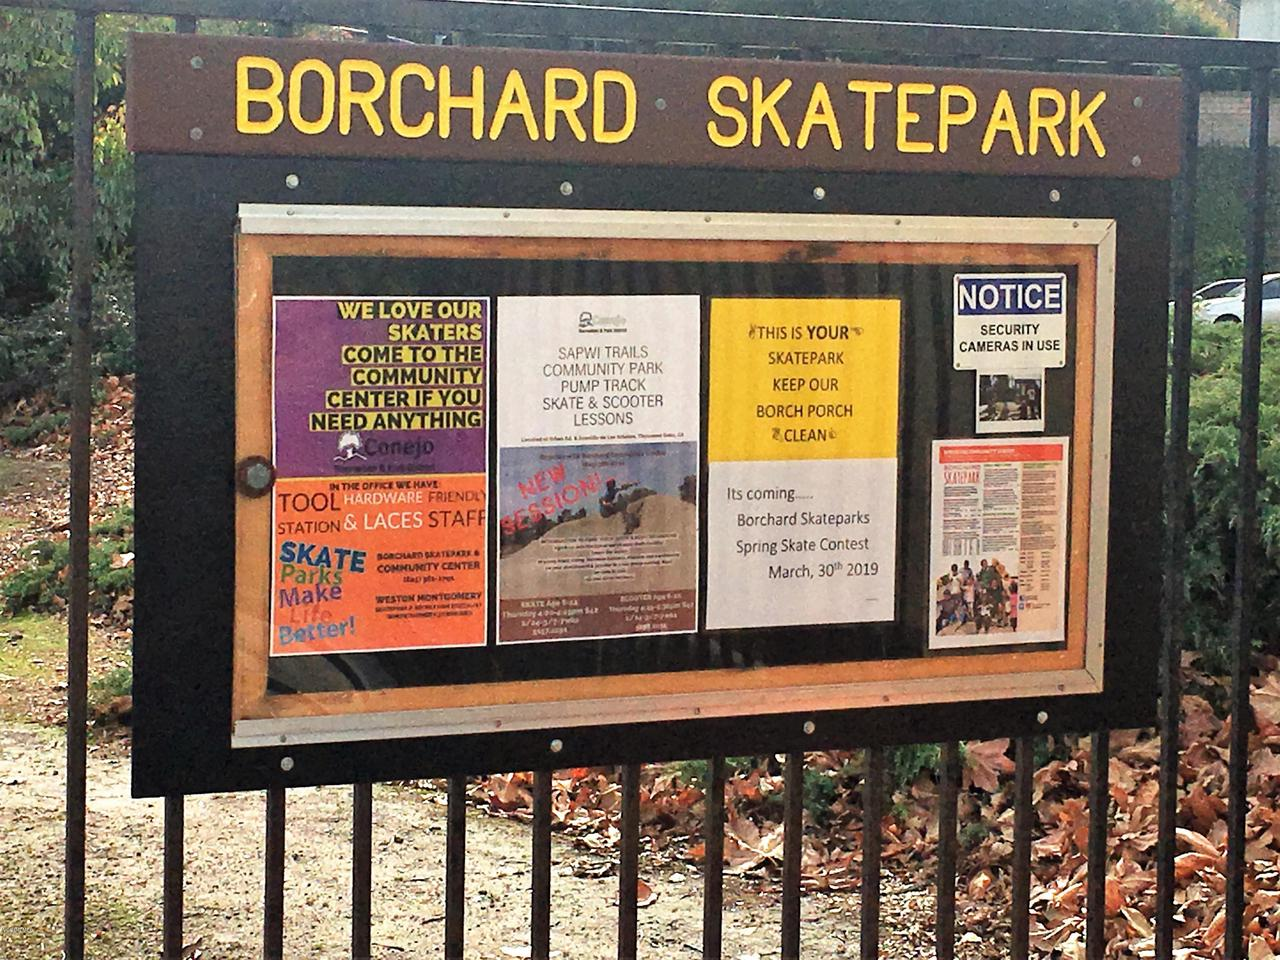 716 CAYO GRANDE, Newbury Park, CA 91320 - 716 Cayo Grande_Borchard Skate Park 1